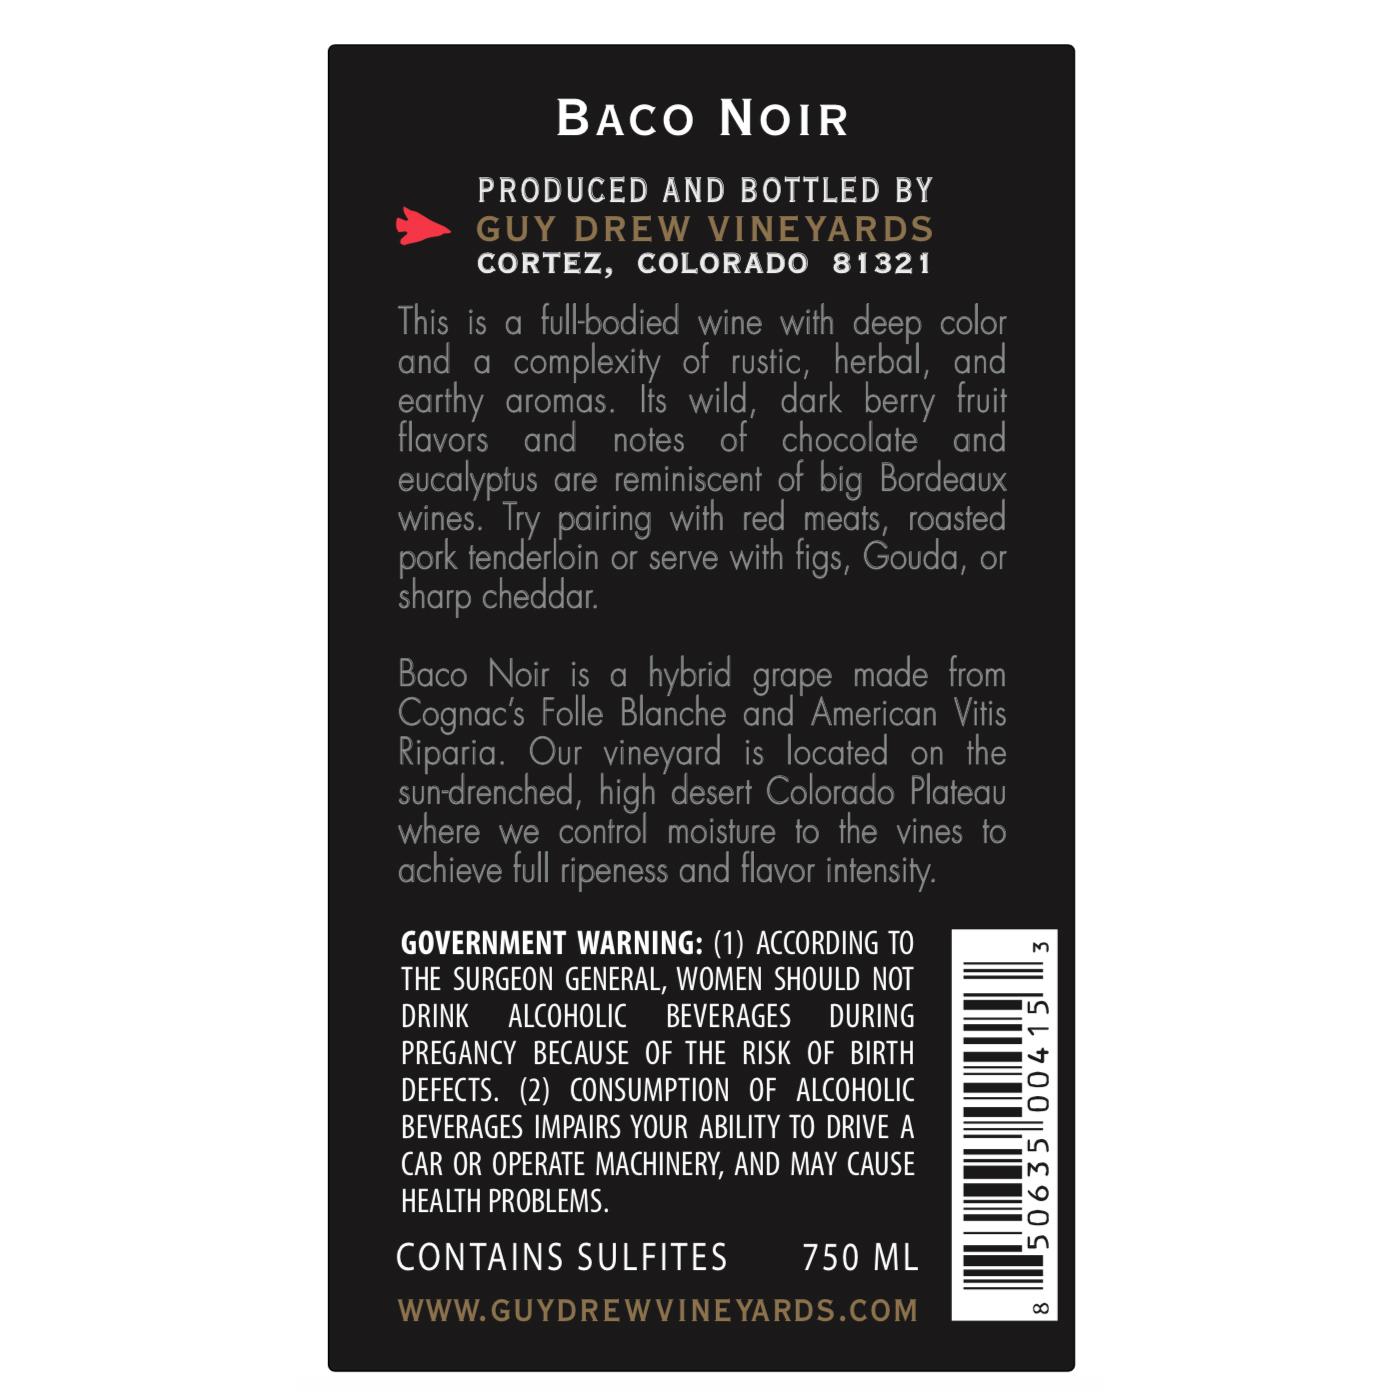 Guy Drew Baco Noir Back Label